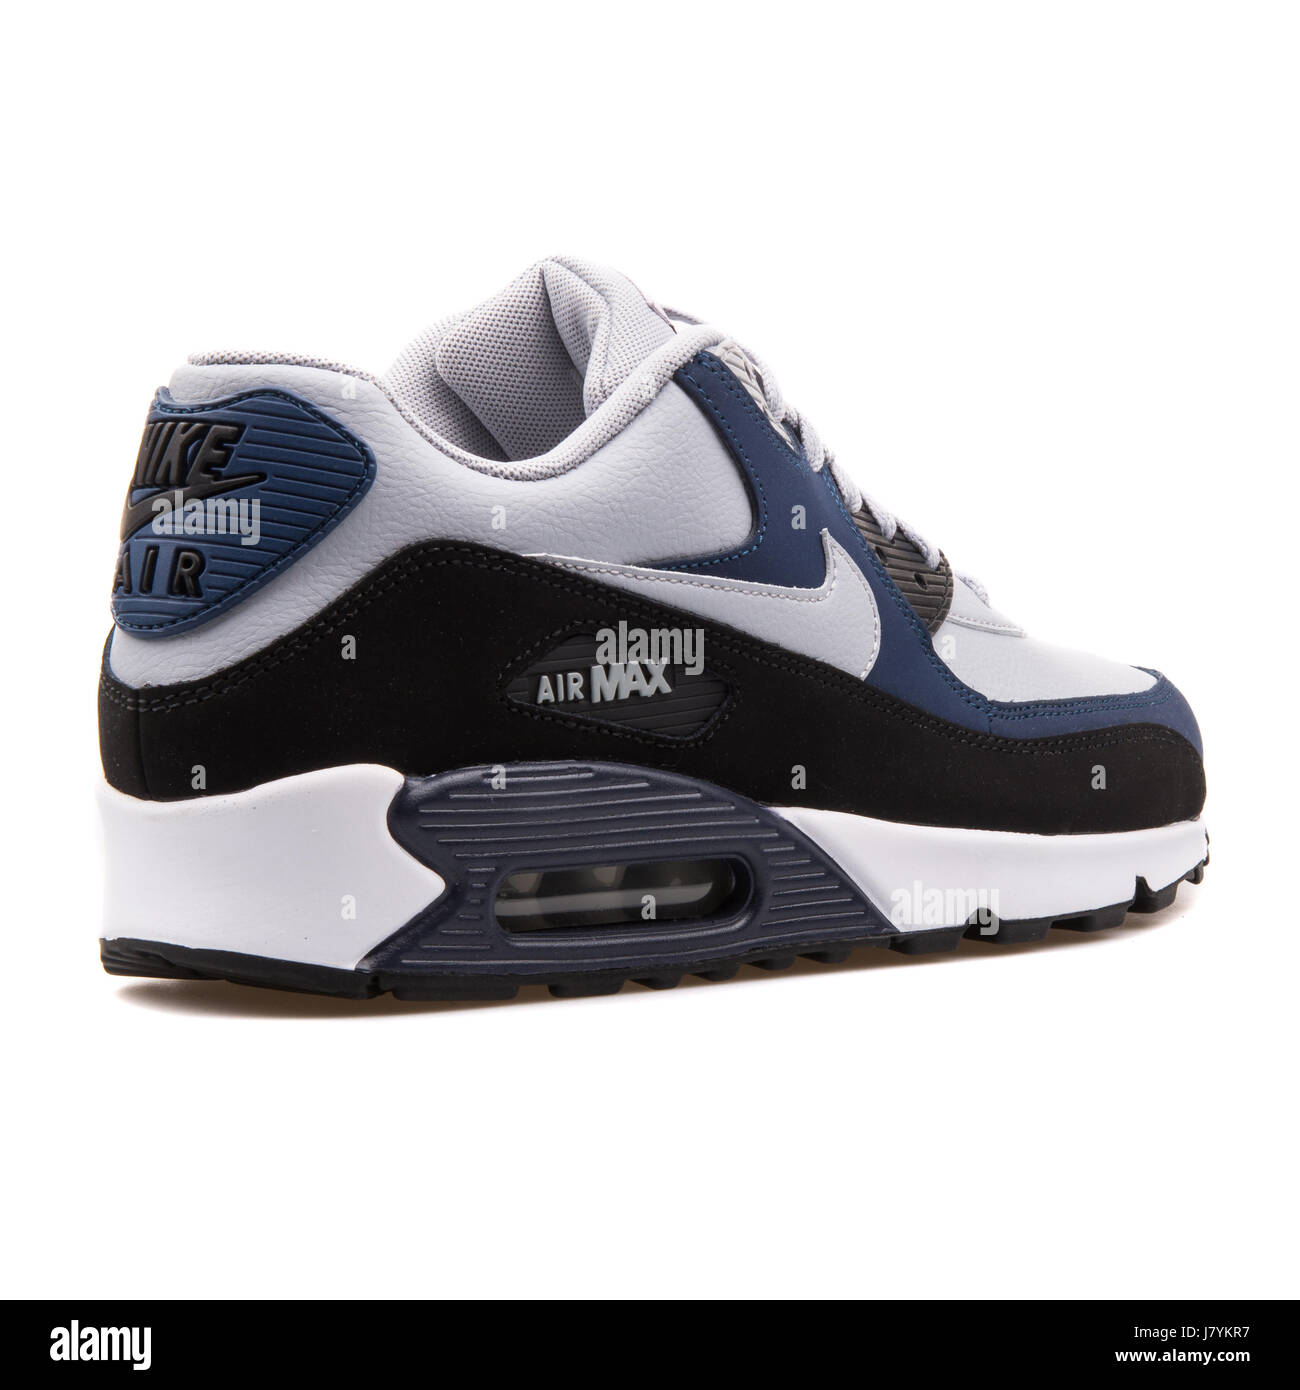 Nike Air Max 90 LTR Grey Navy Blue Men Sports Sneakers